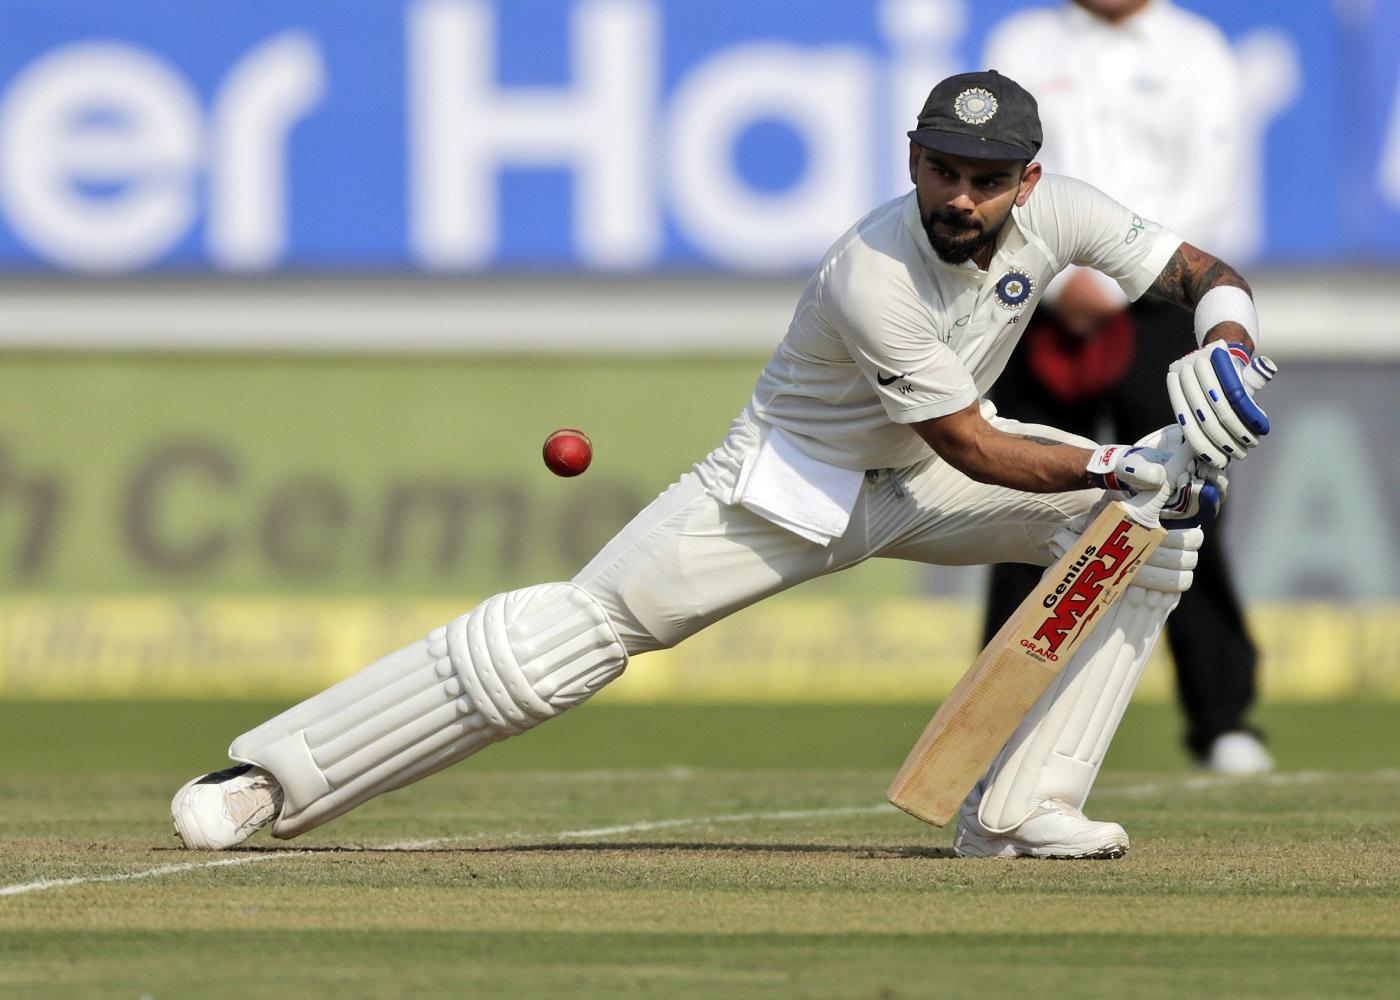 India vs West Indies 2018: Virat Kohli On The Verge Of Breaking Another Sachin Tendulkar Record 2